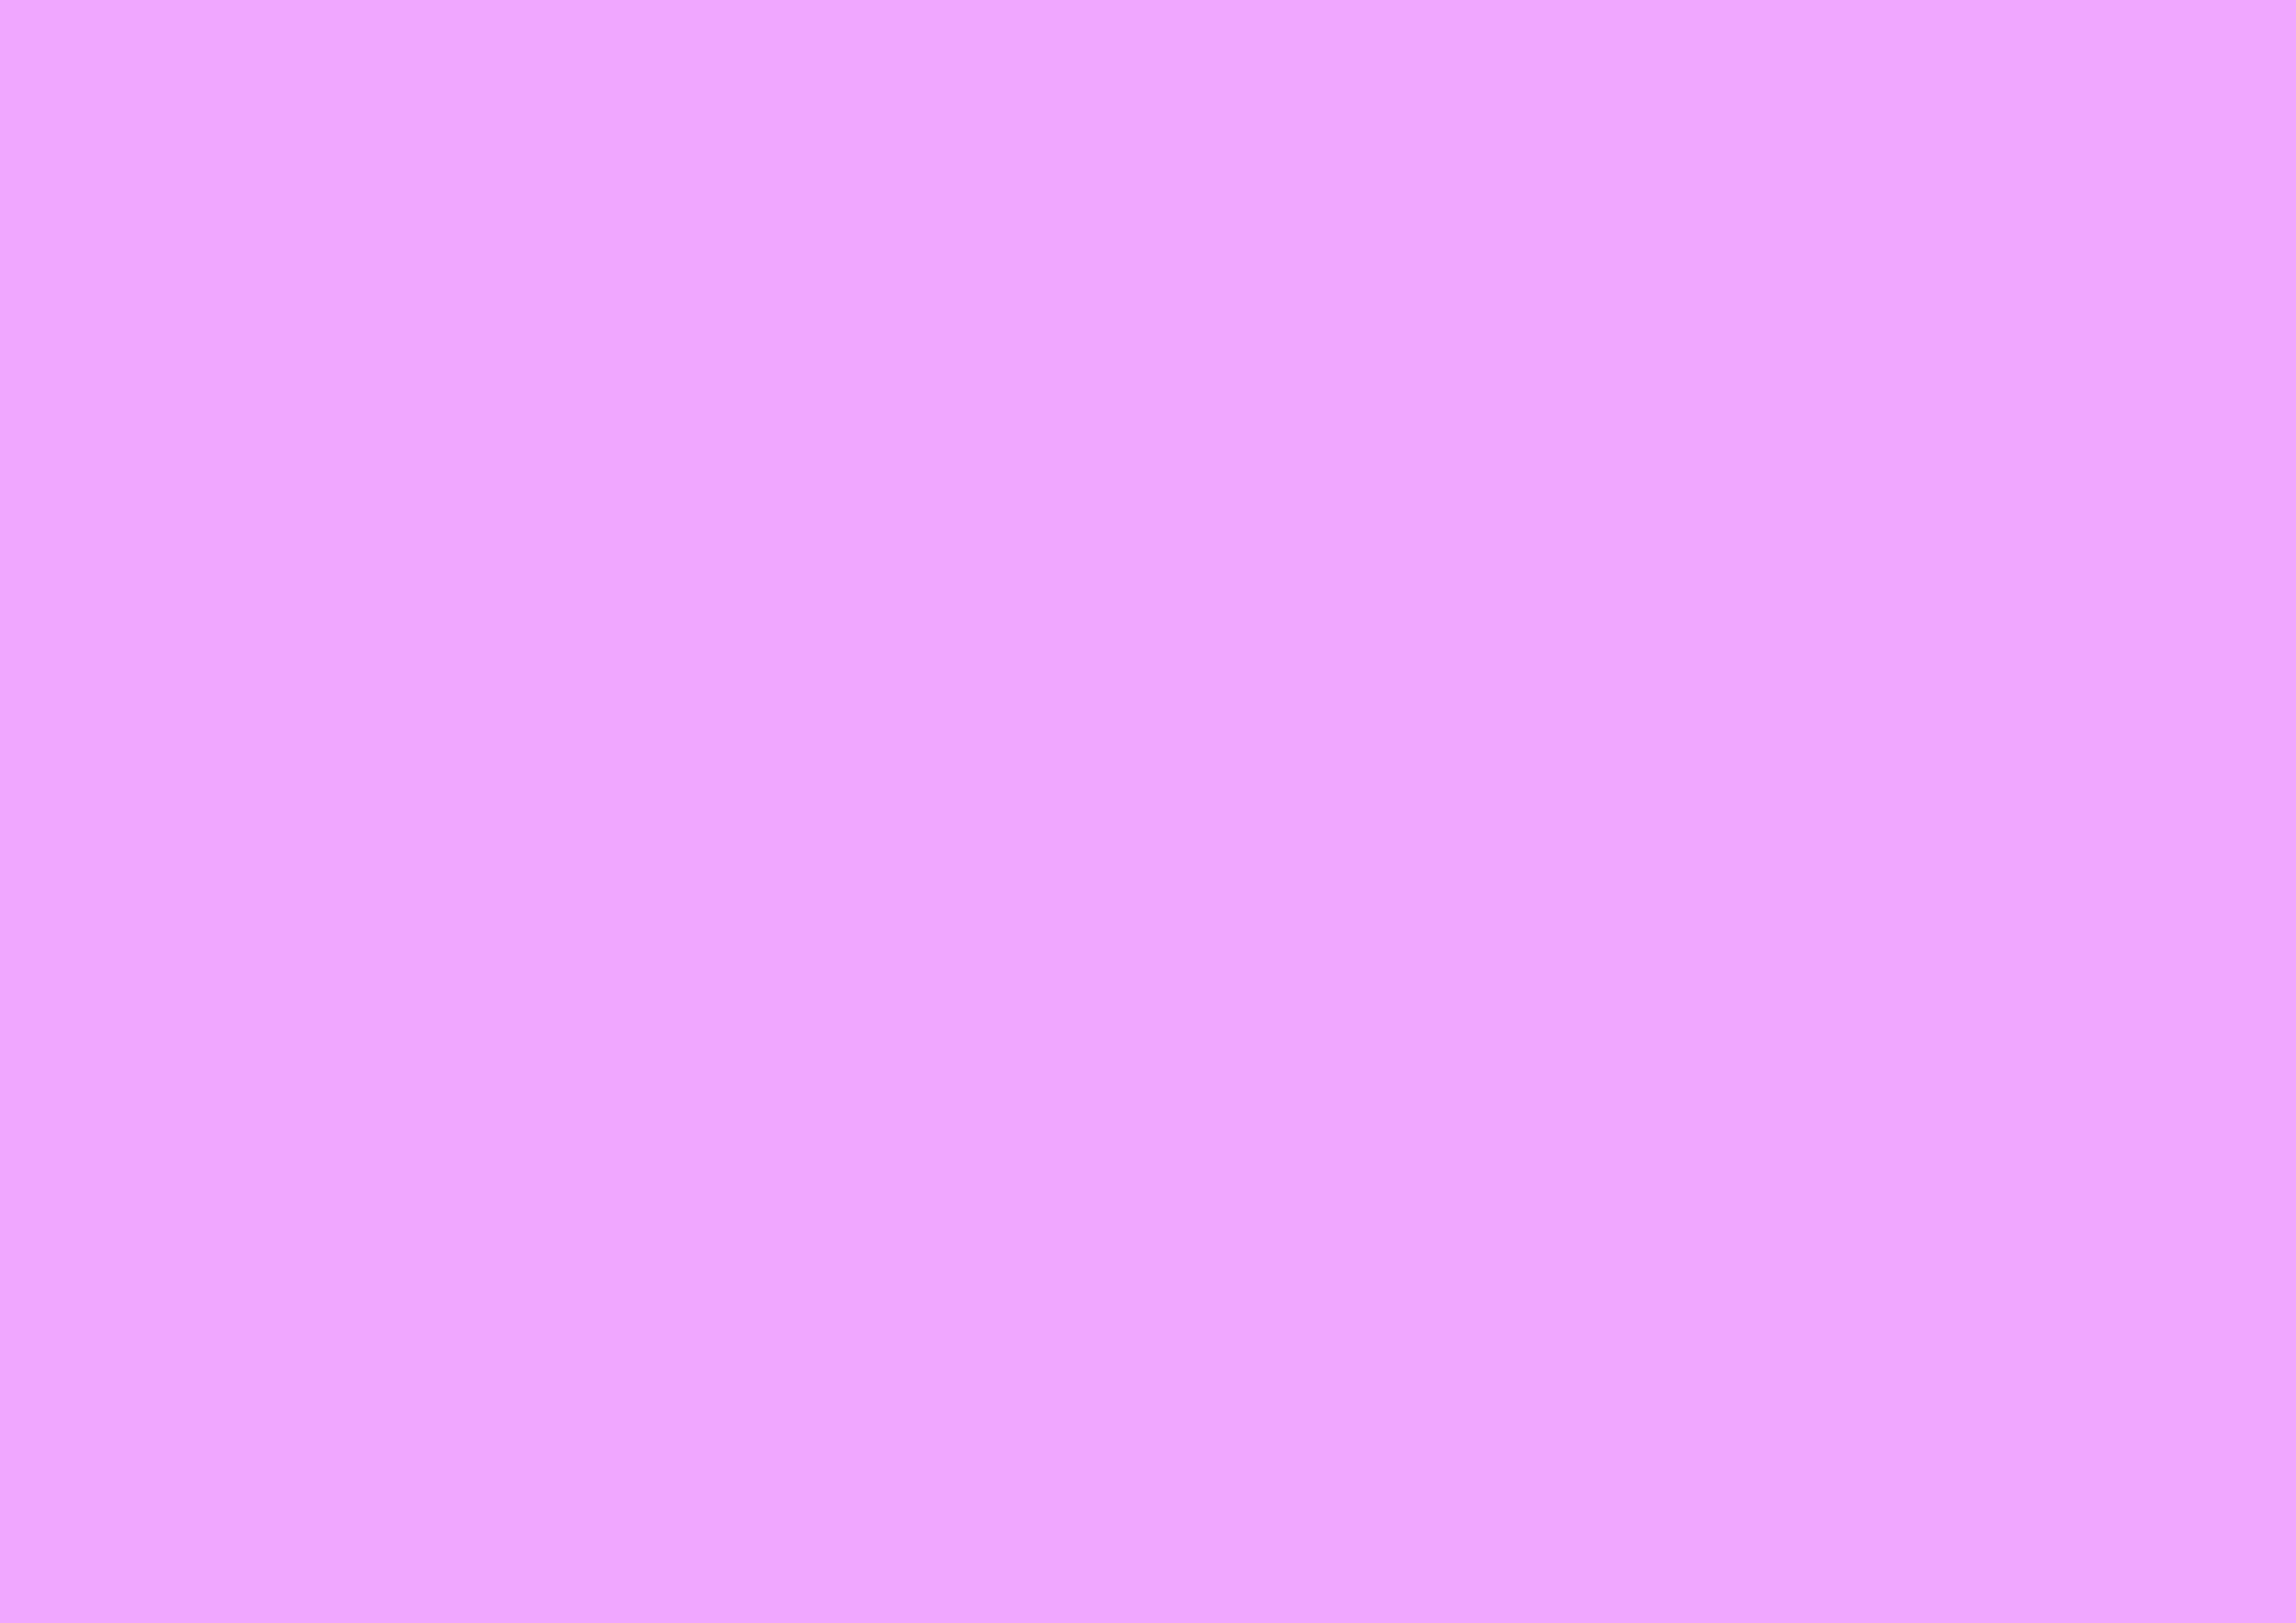 3508x2480 Rich Brilliant Lavender Solid Color Background